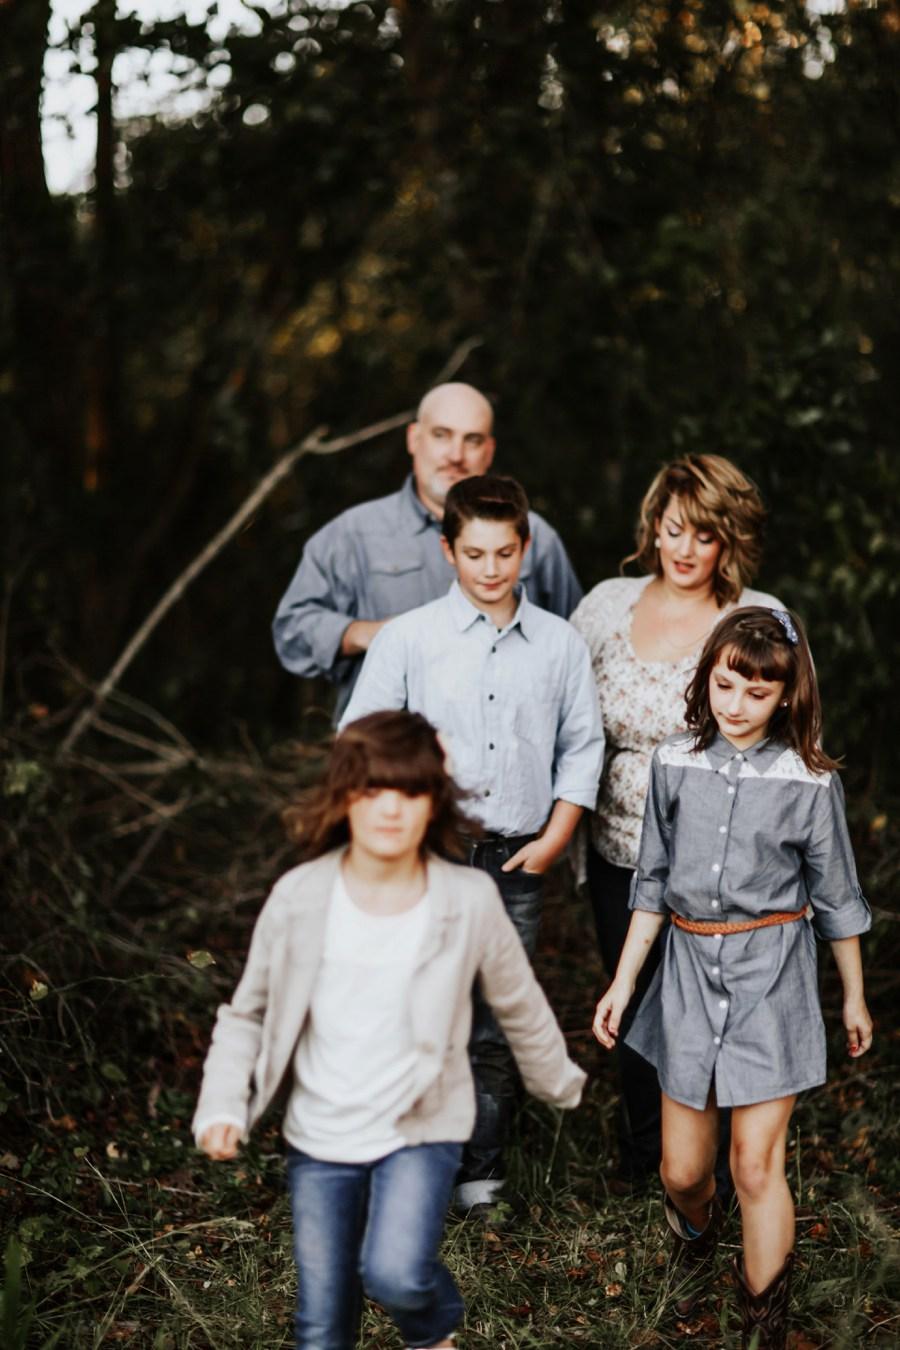 lifestyle_family_photographer_north_carolina_weaver_family_kandis_marino_photography_0022.jpg